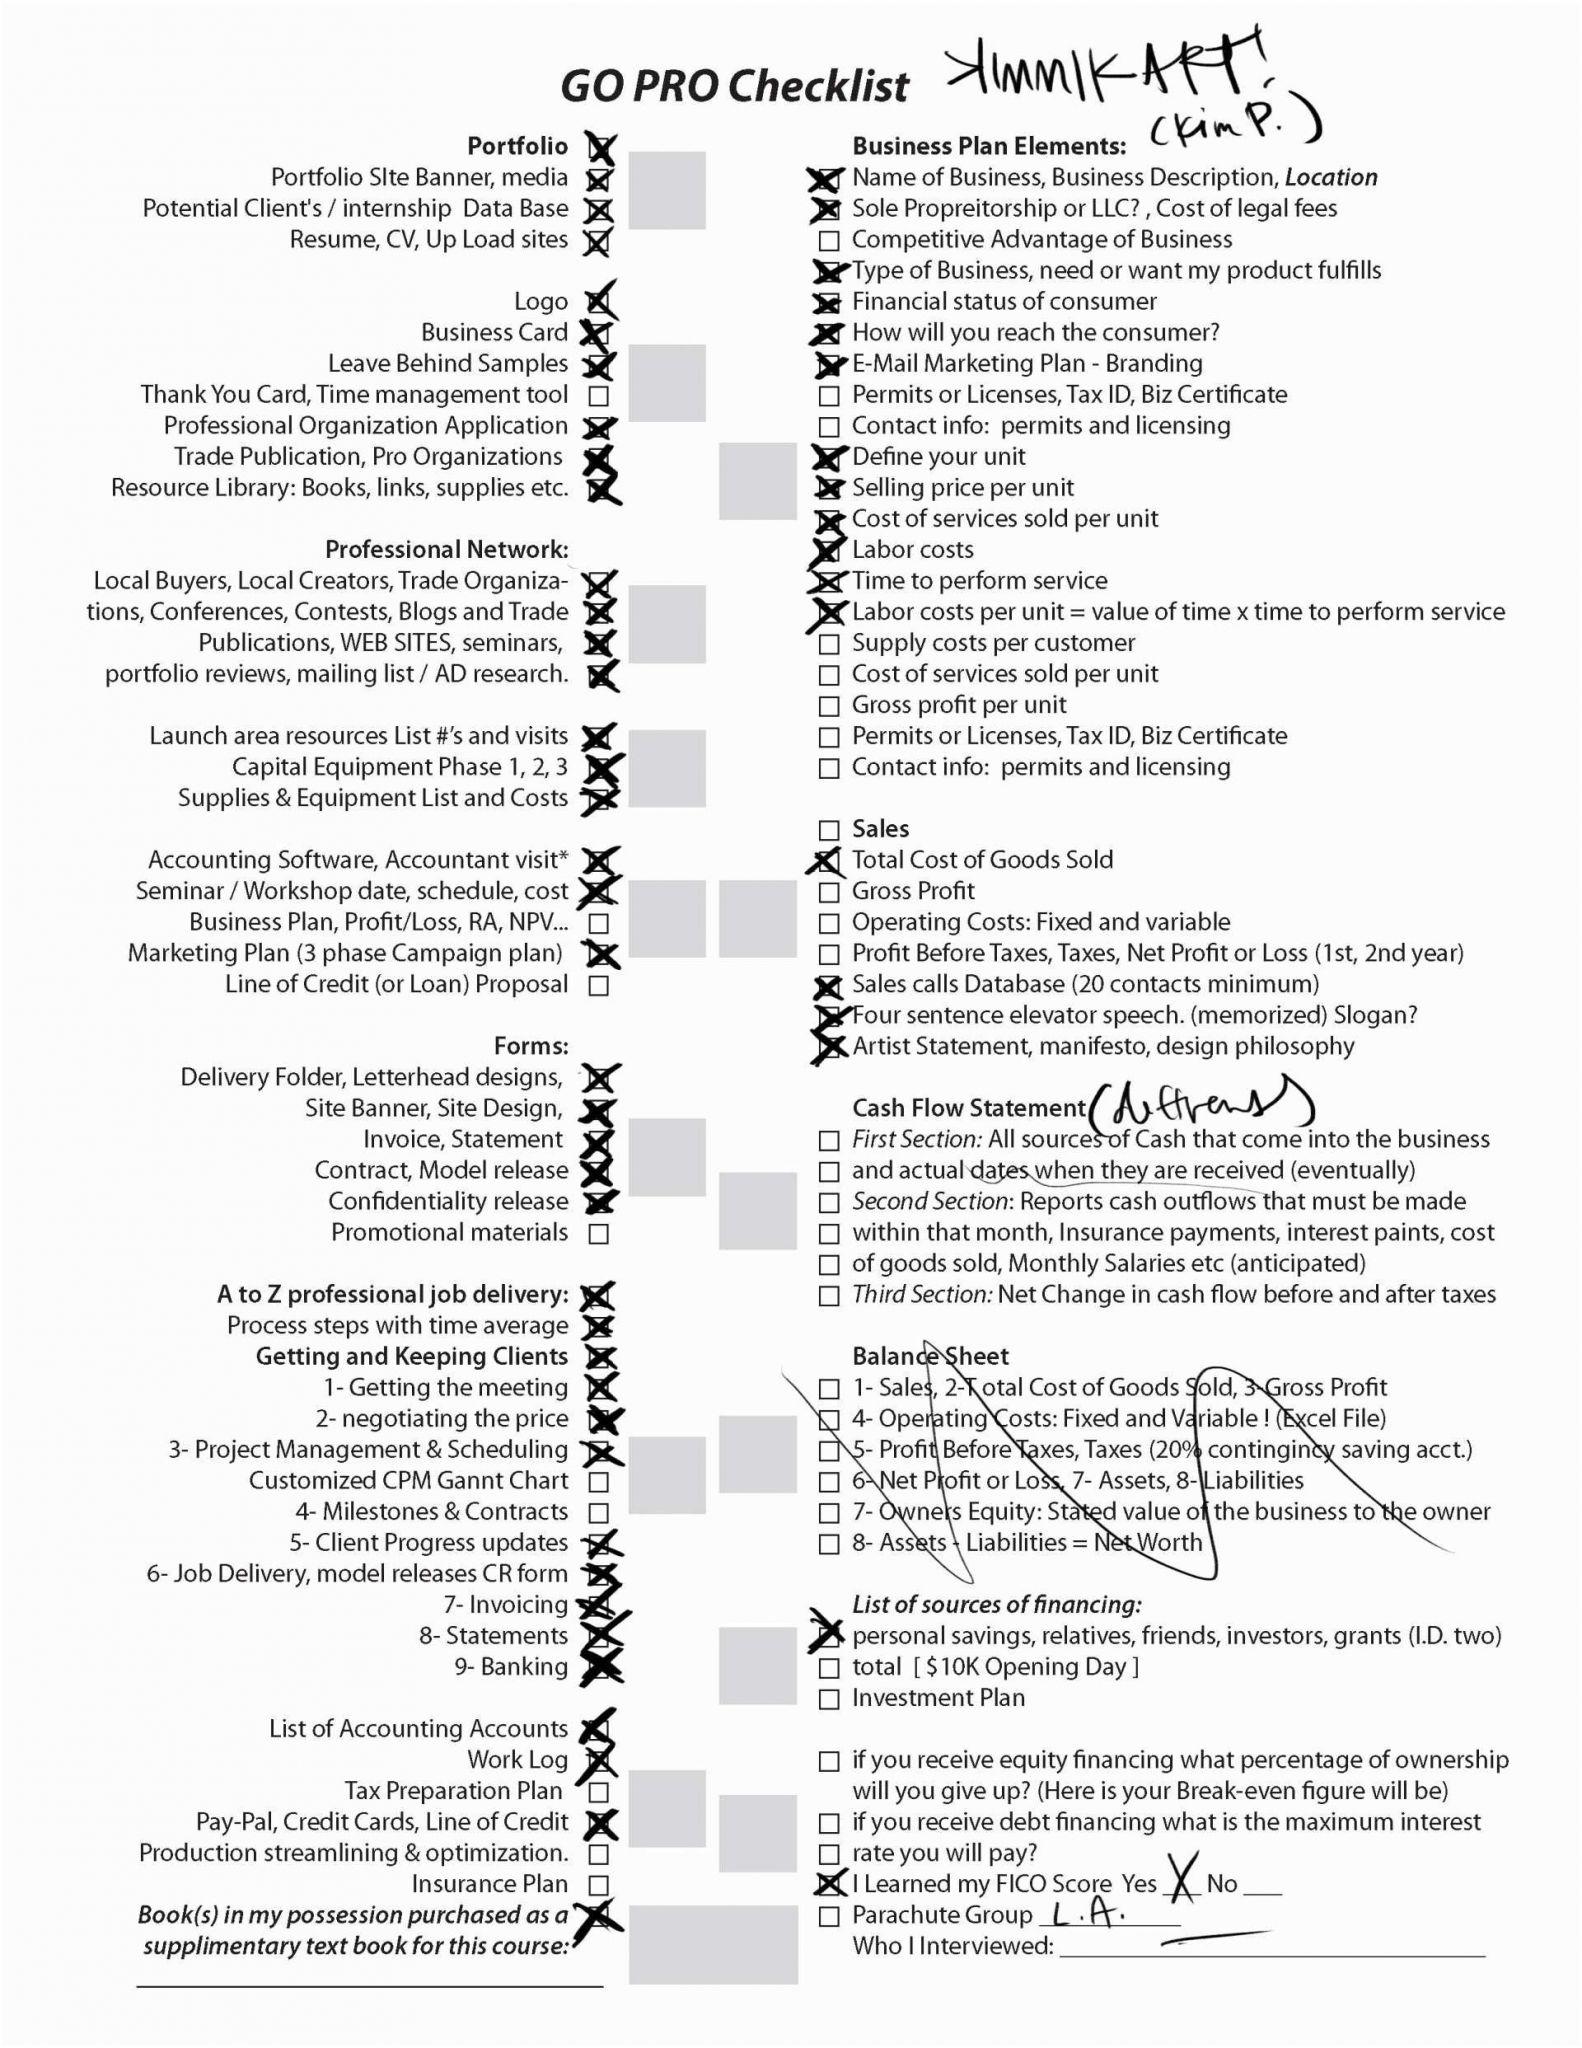 5Th Grade Spelling Words Worksheets | Briefencounters | Free Printable Spelling Worksheets For 5Th Grade